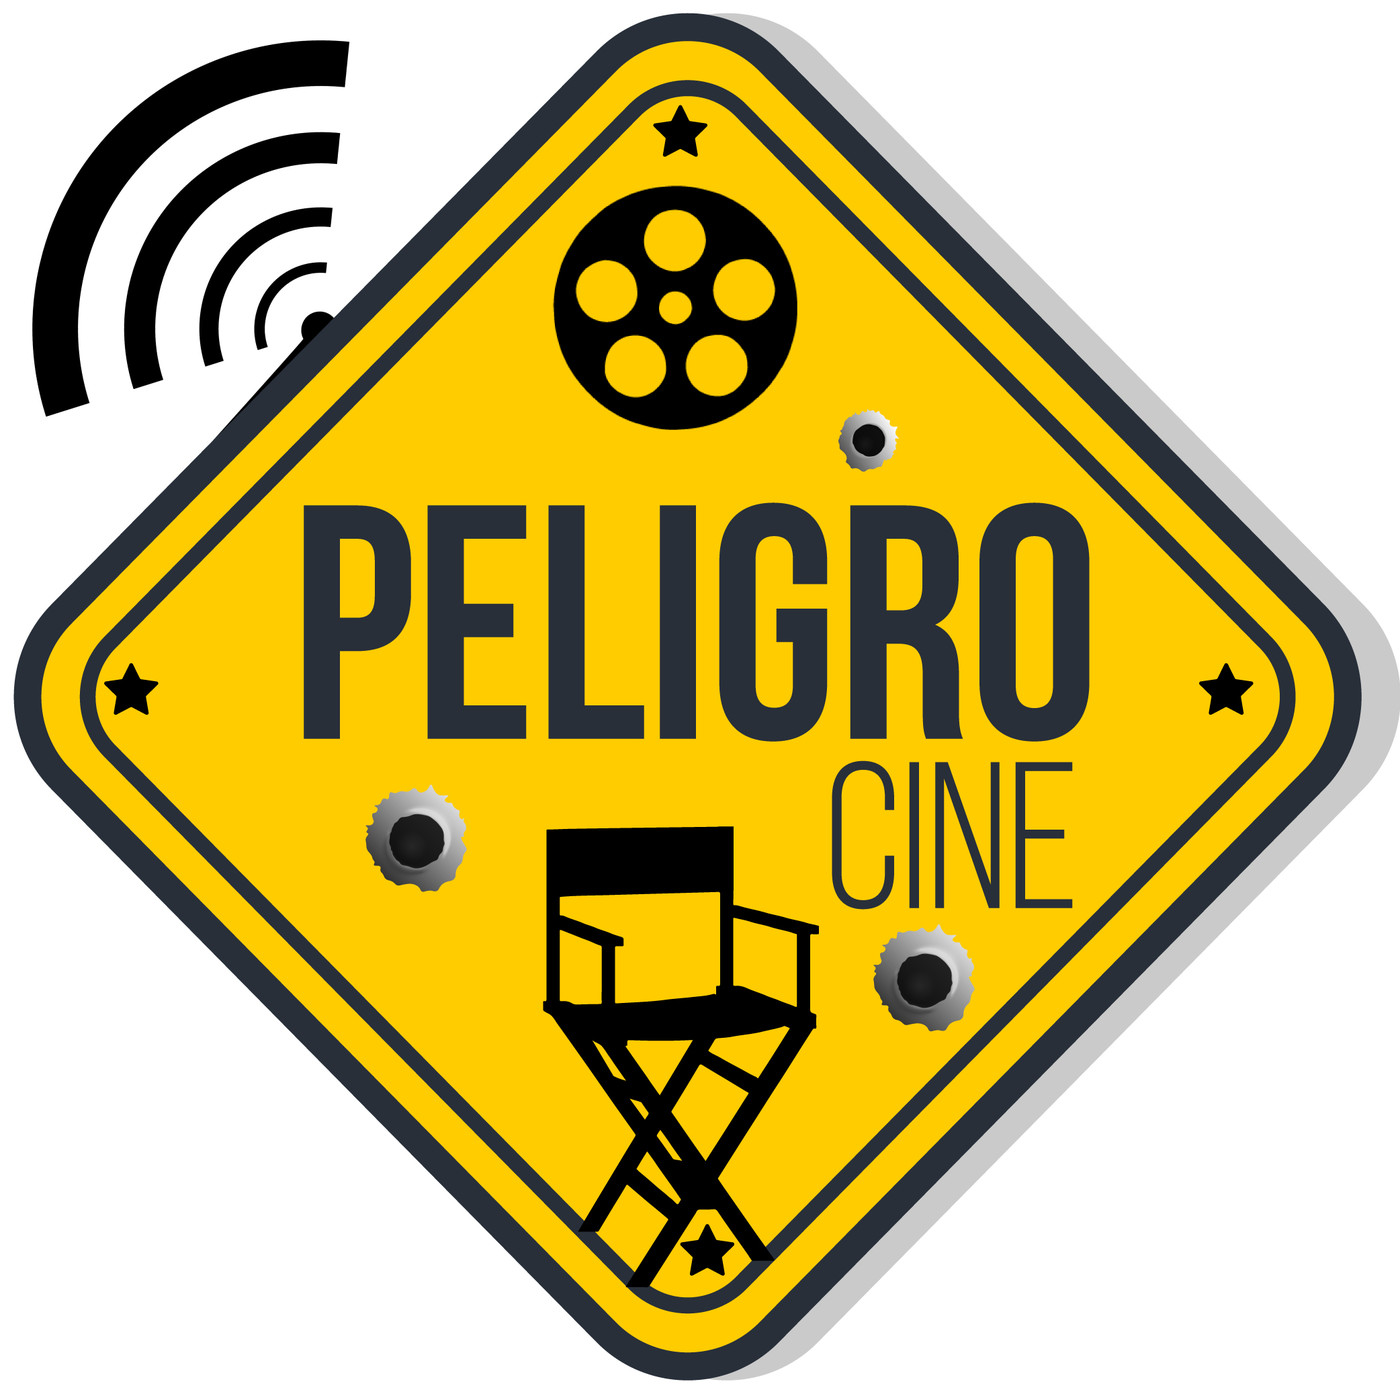 Peligro, Cine - 2X04 - Cine Documental - El chico que conquistó Hollywood - Elliot Page - The Last Dance - Dziga Vertov